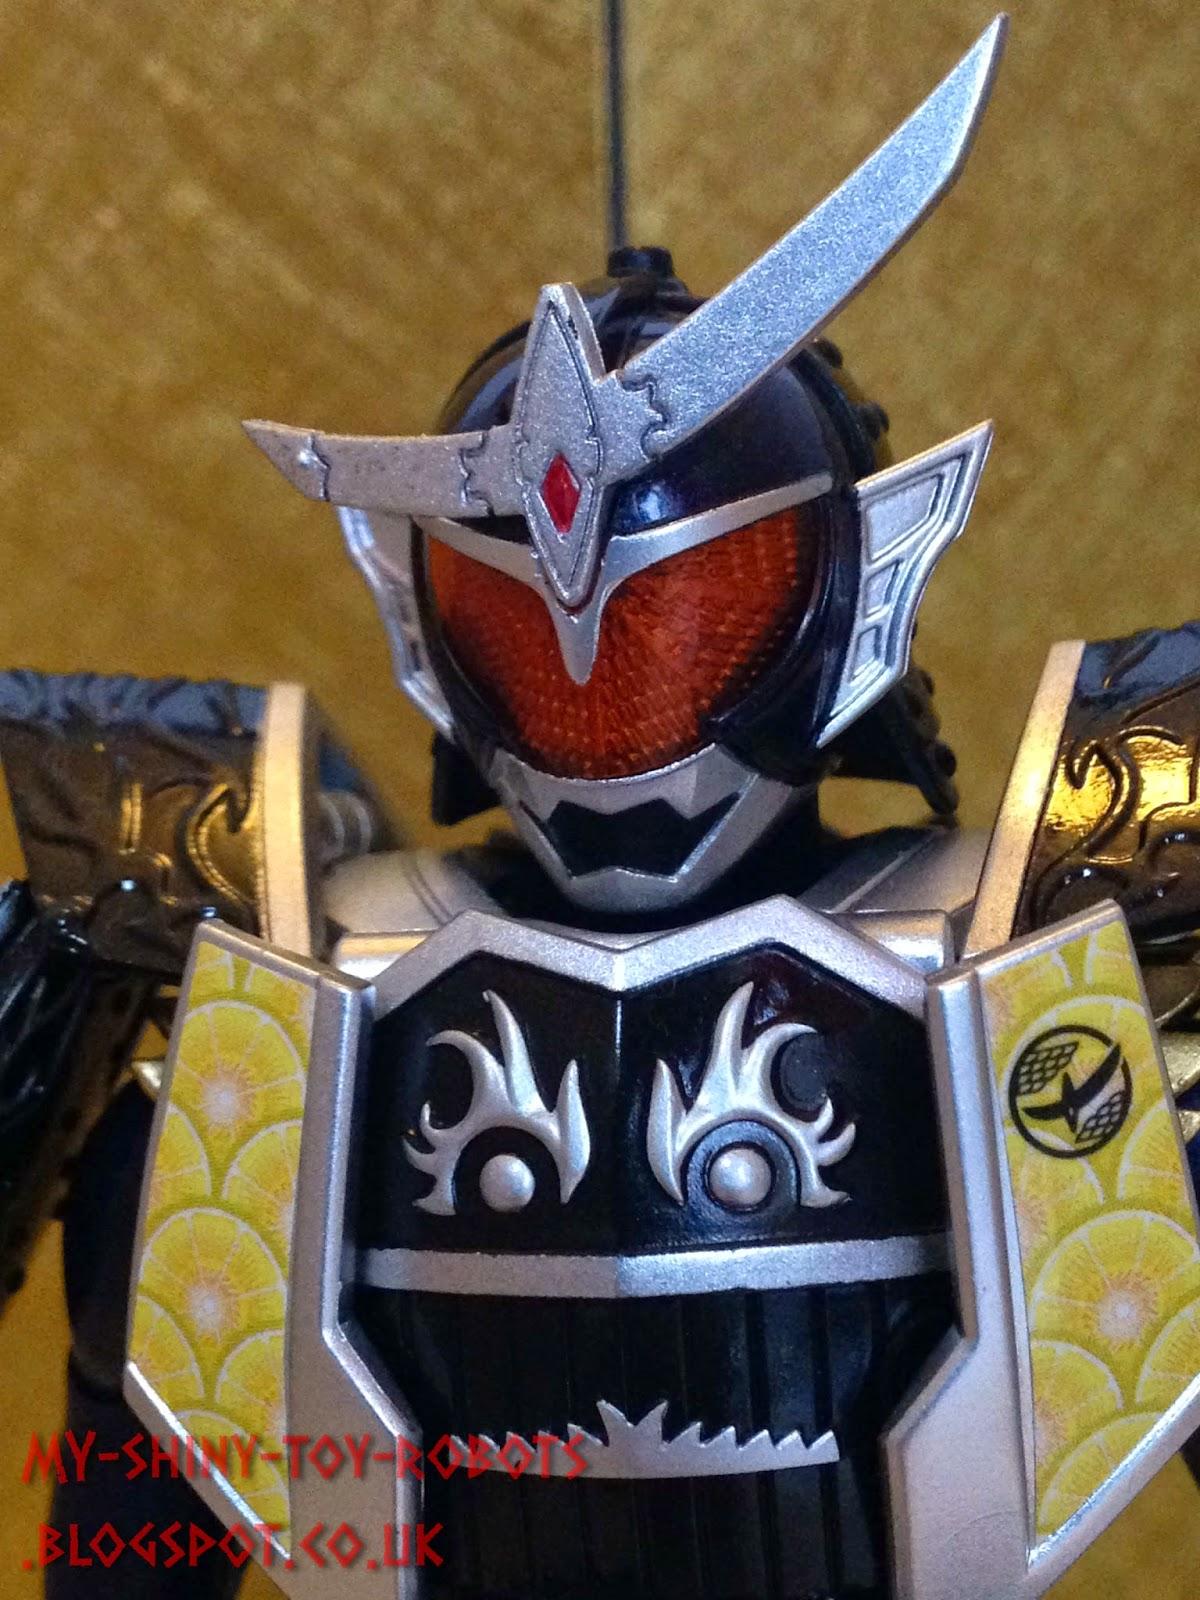 S.H. Figuarts Kamen Rider Gaim Jimber Lemon Arms